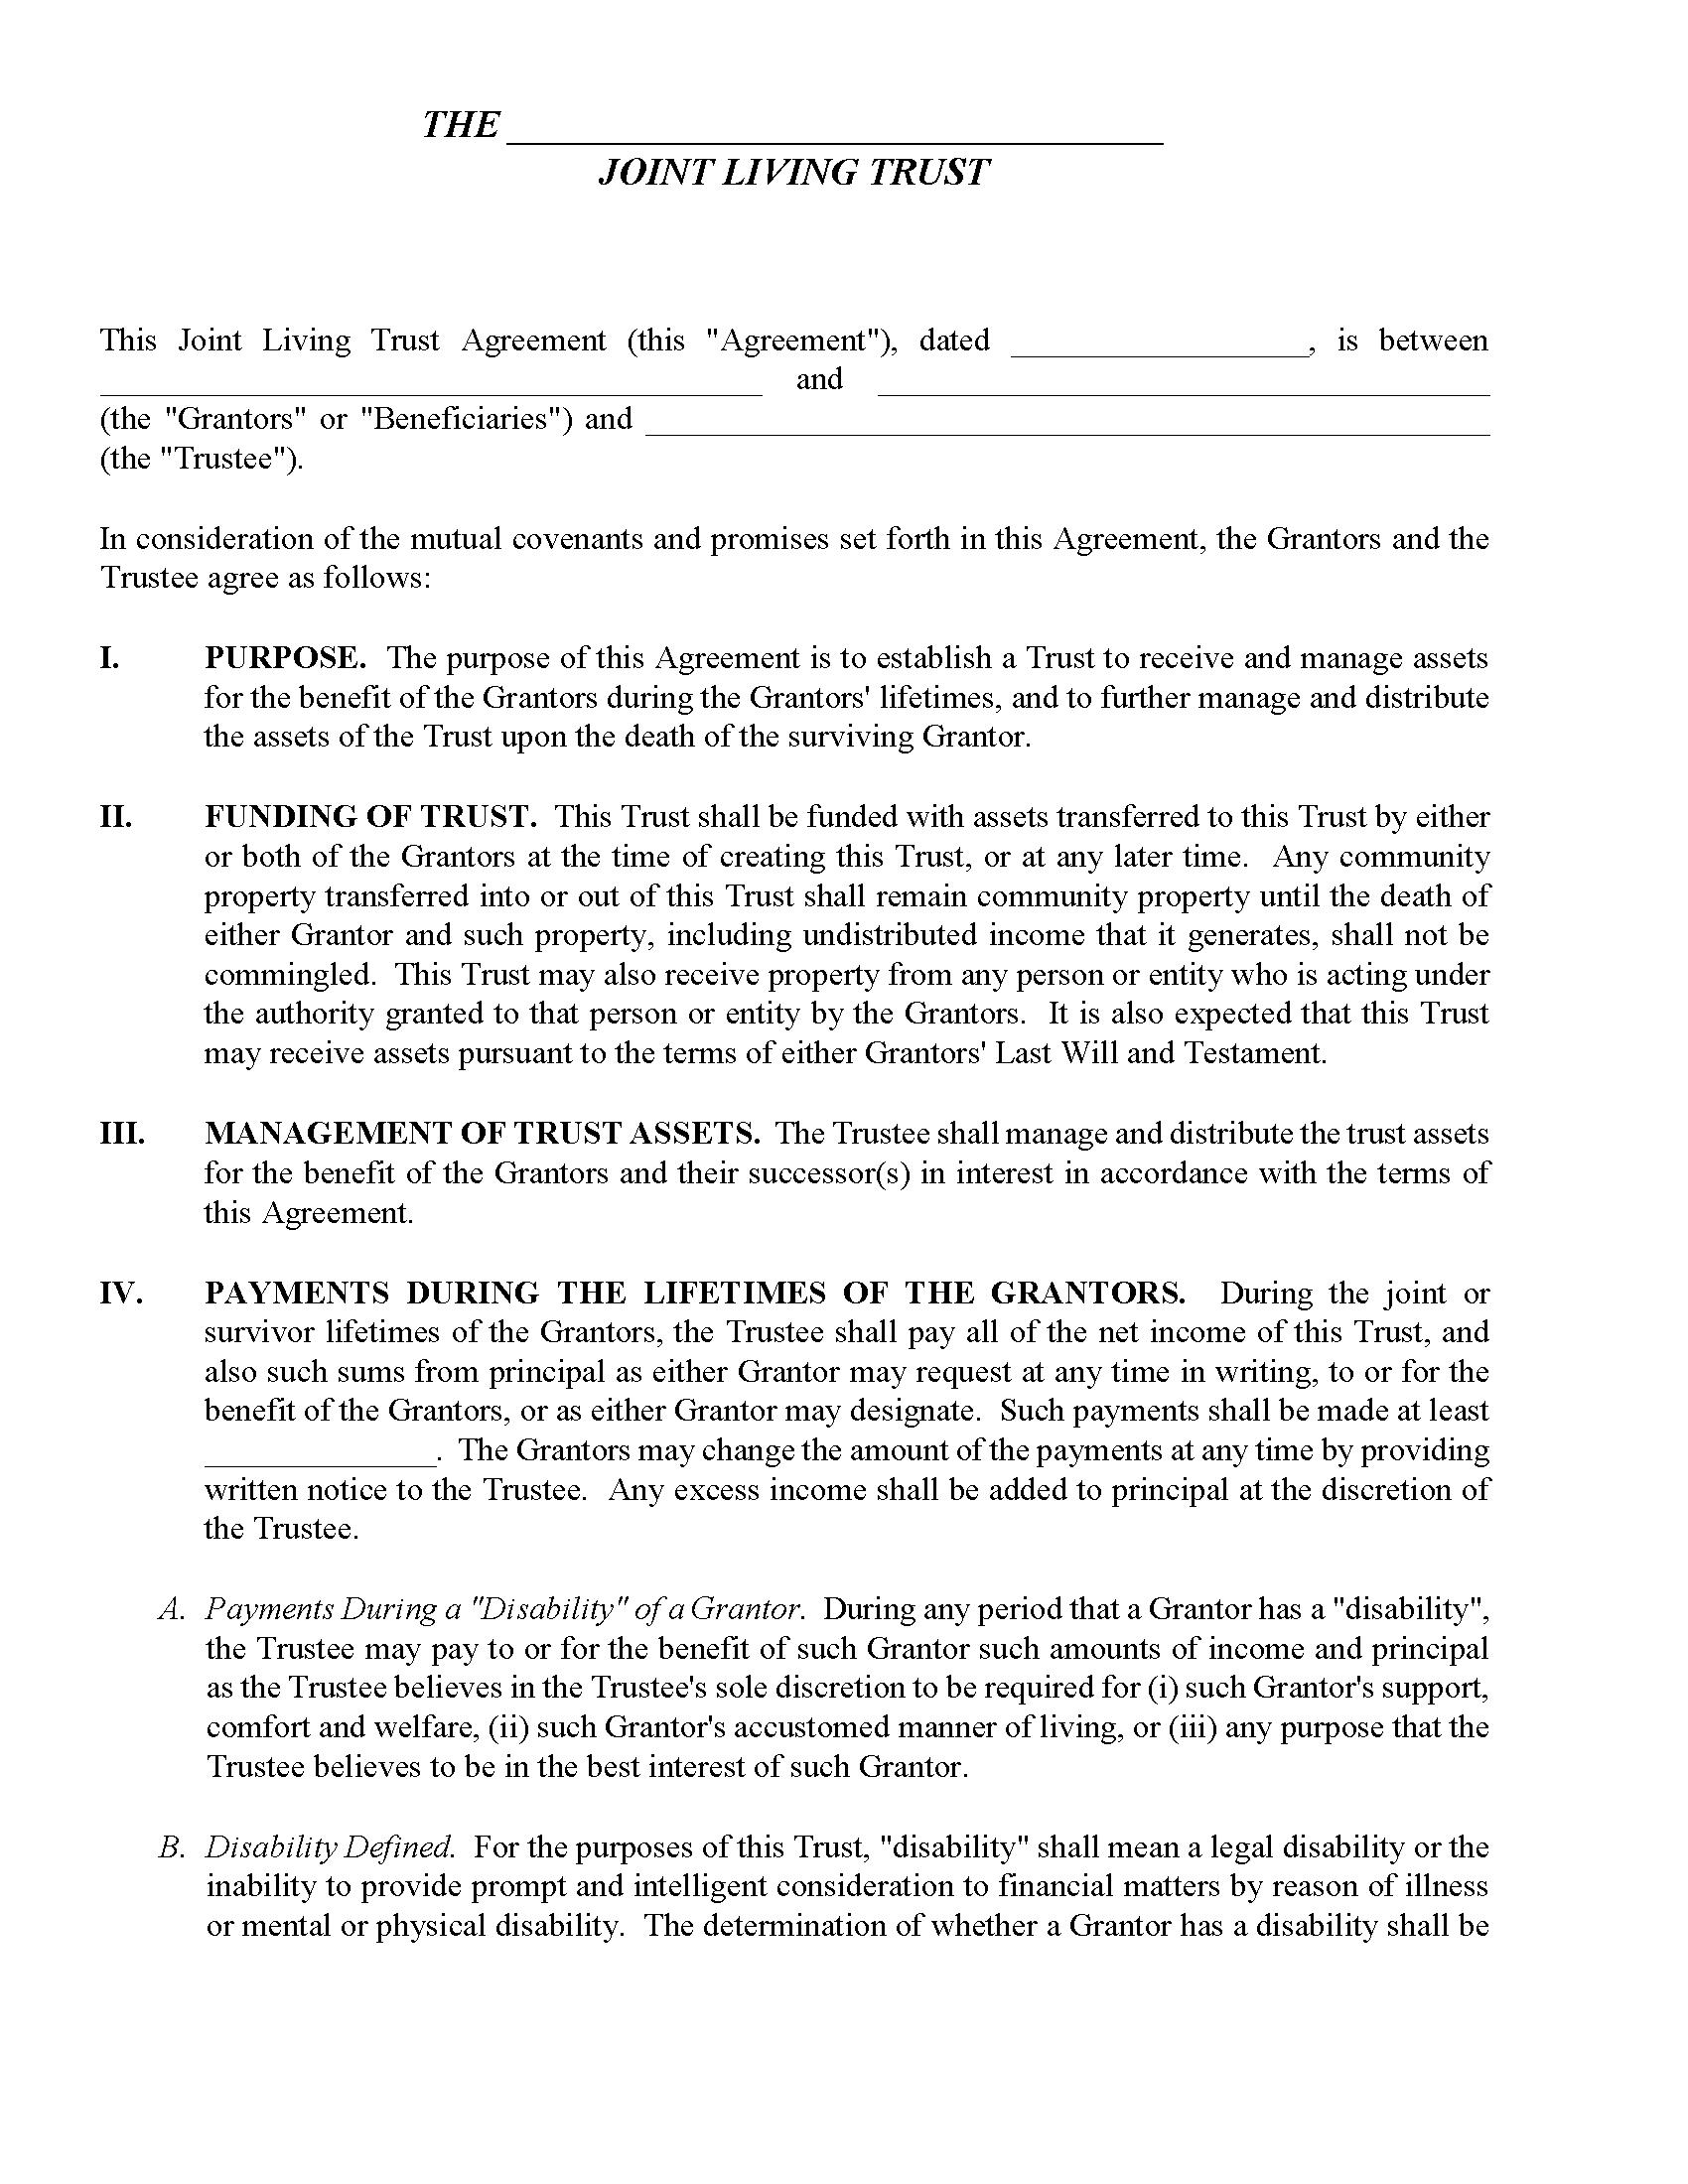 Minnesota Joint Living Trust Form